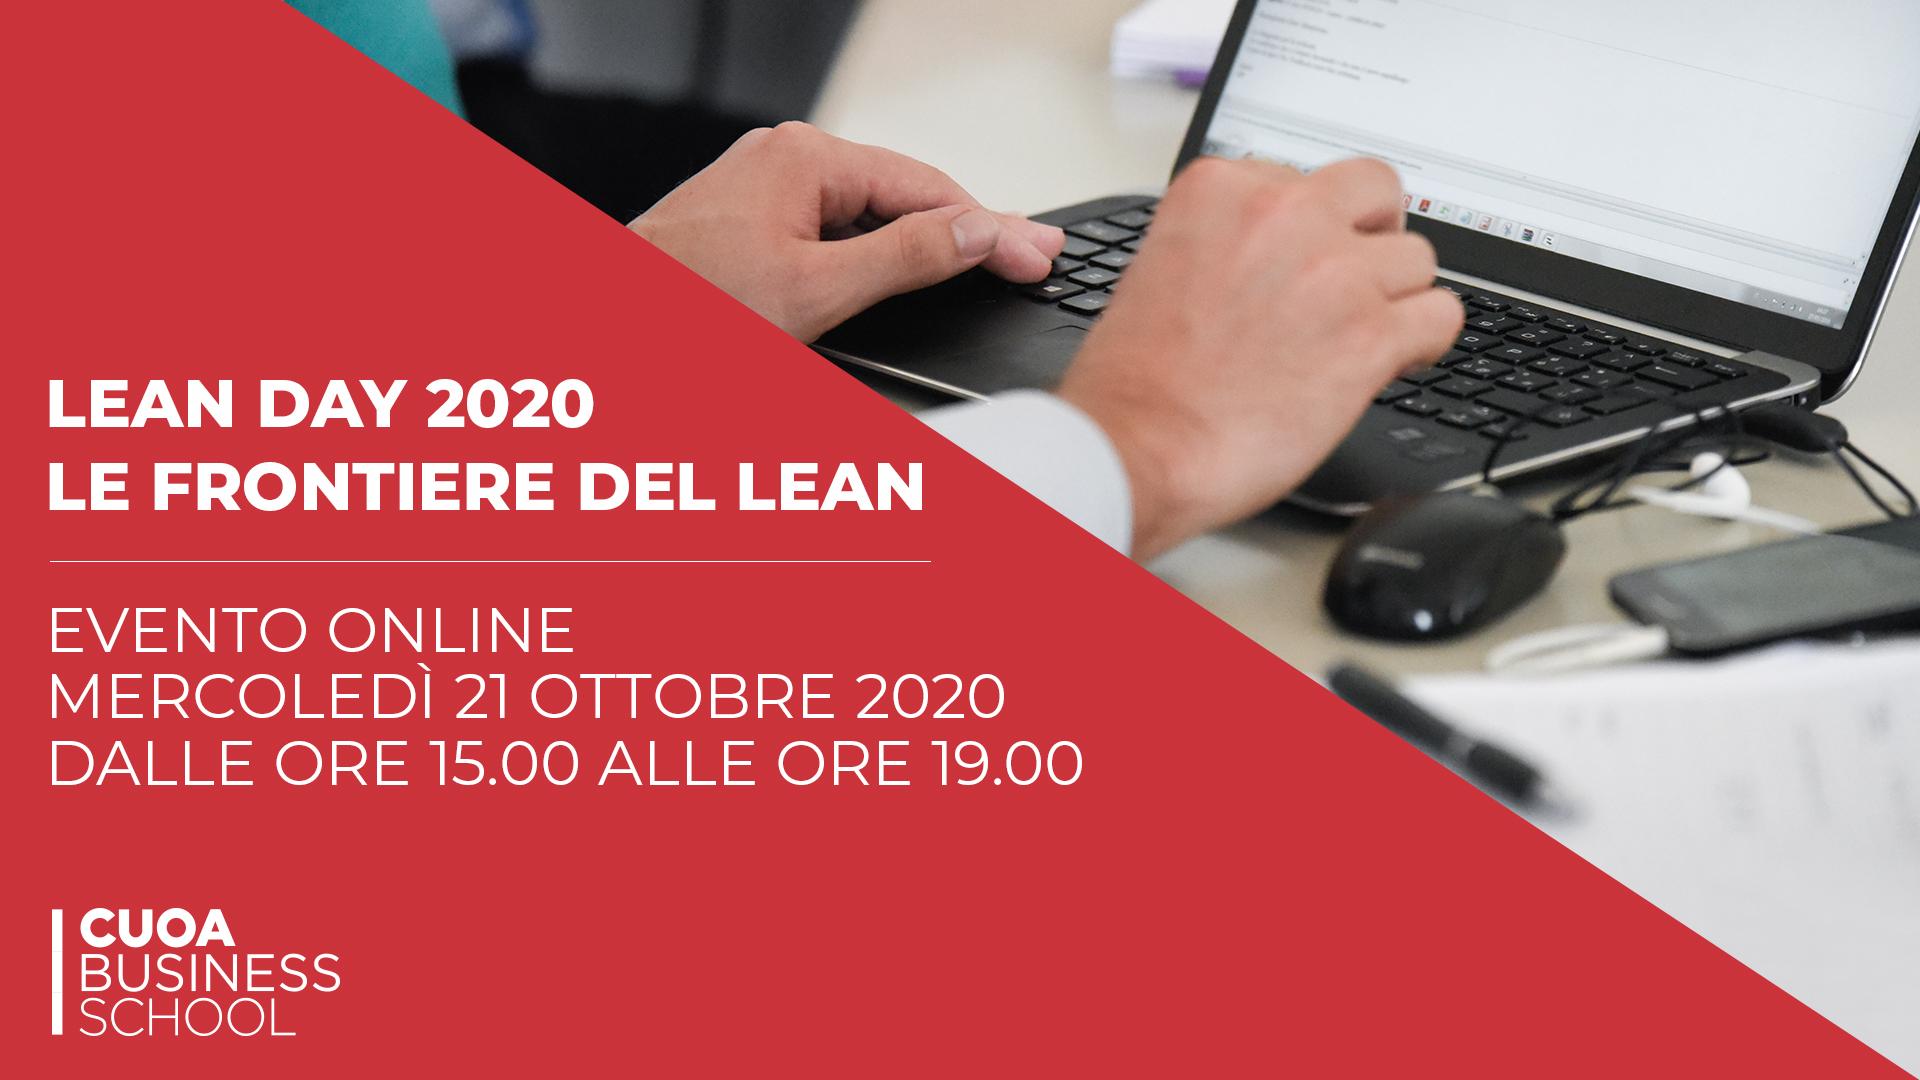 LEAN Day 2020: le frontiere del Lean